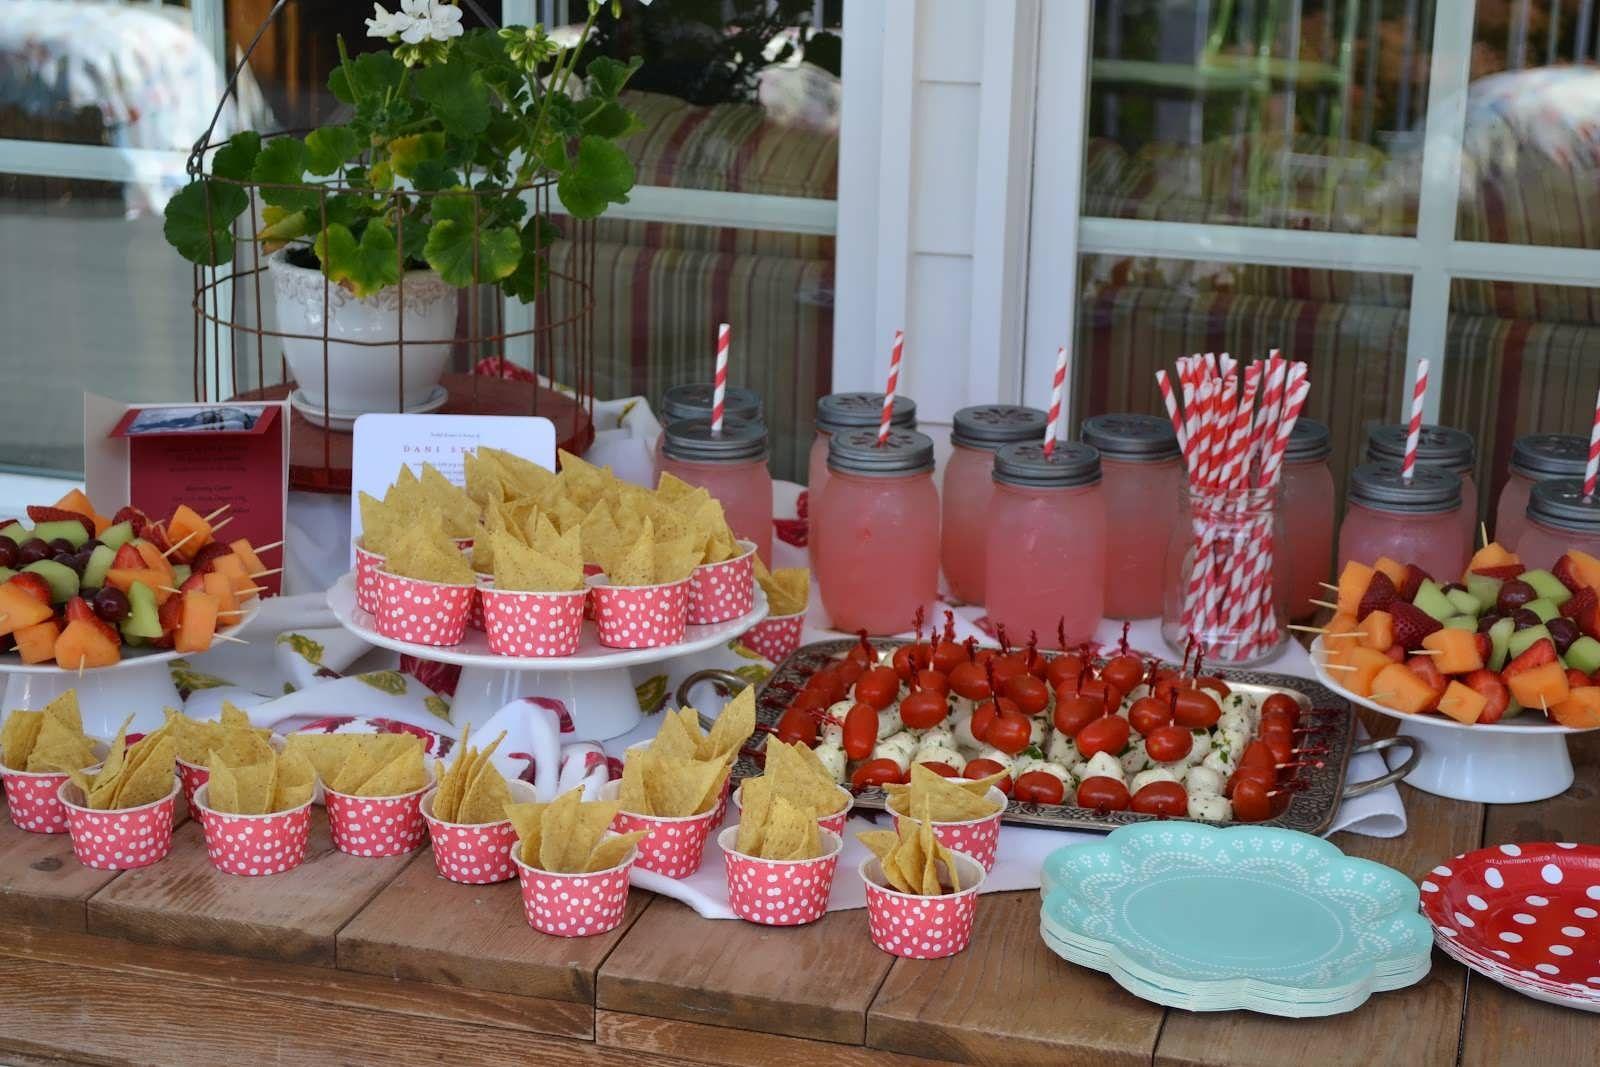 Pinterest Bridal Shower: Bridal Shower Luncheon Food Ideas